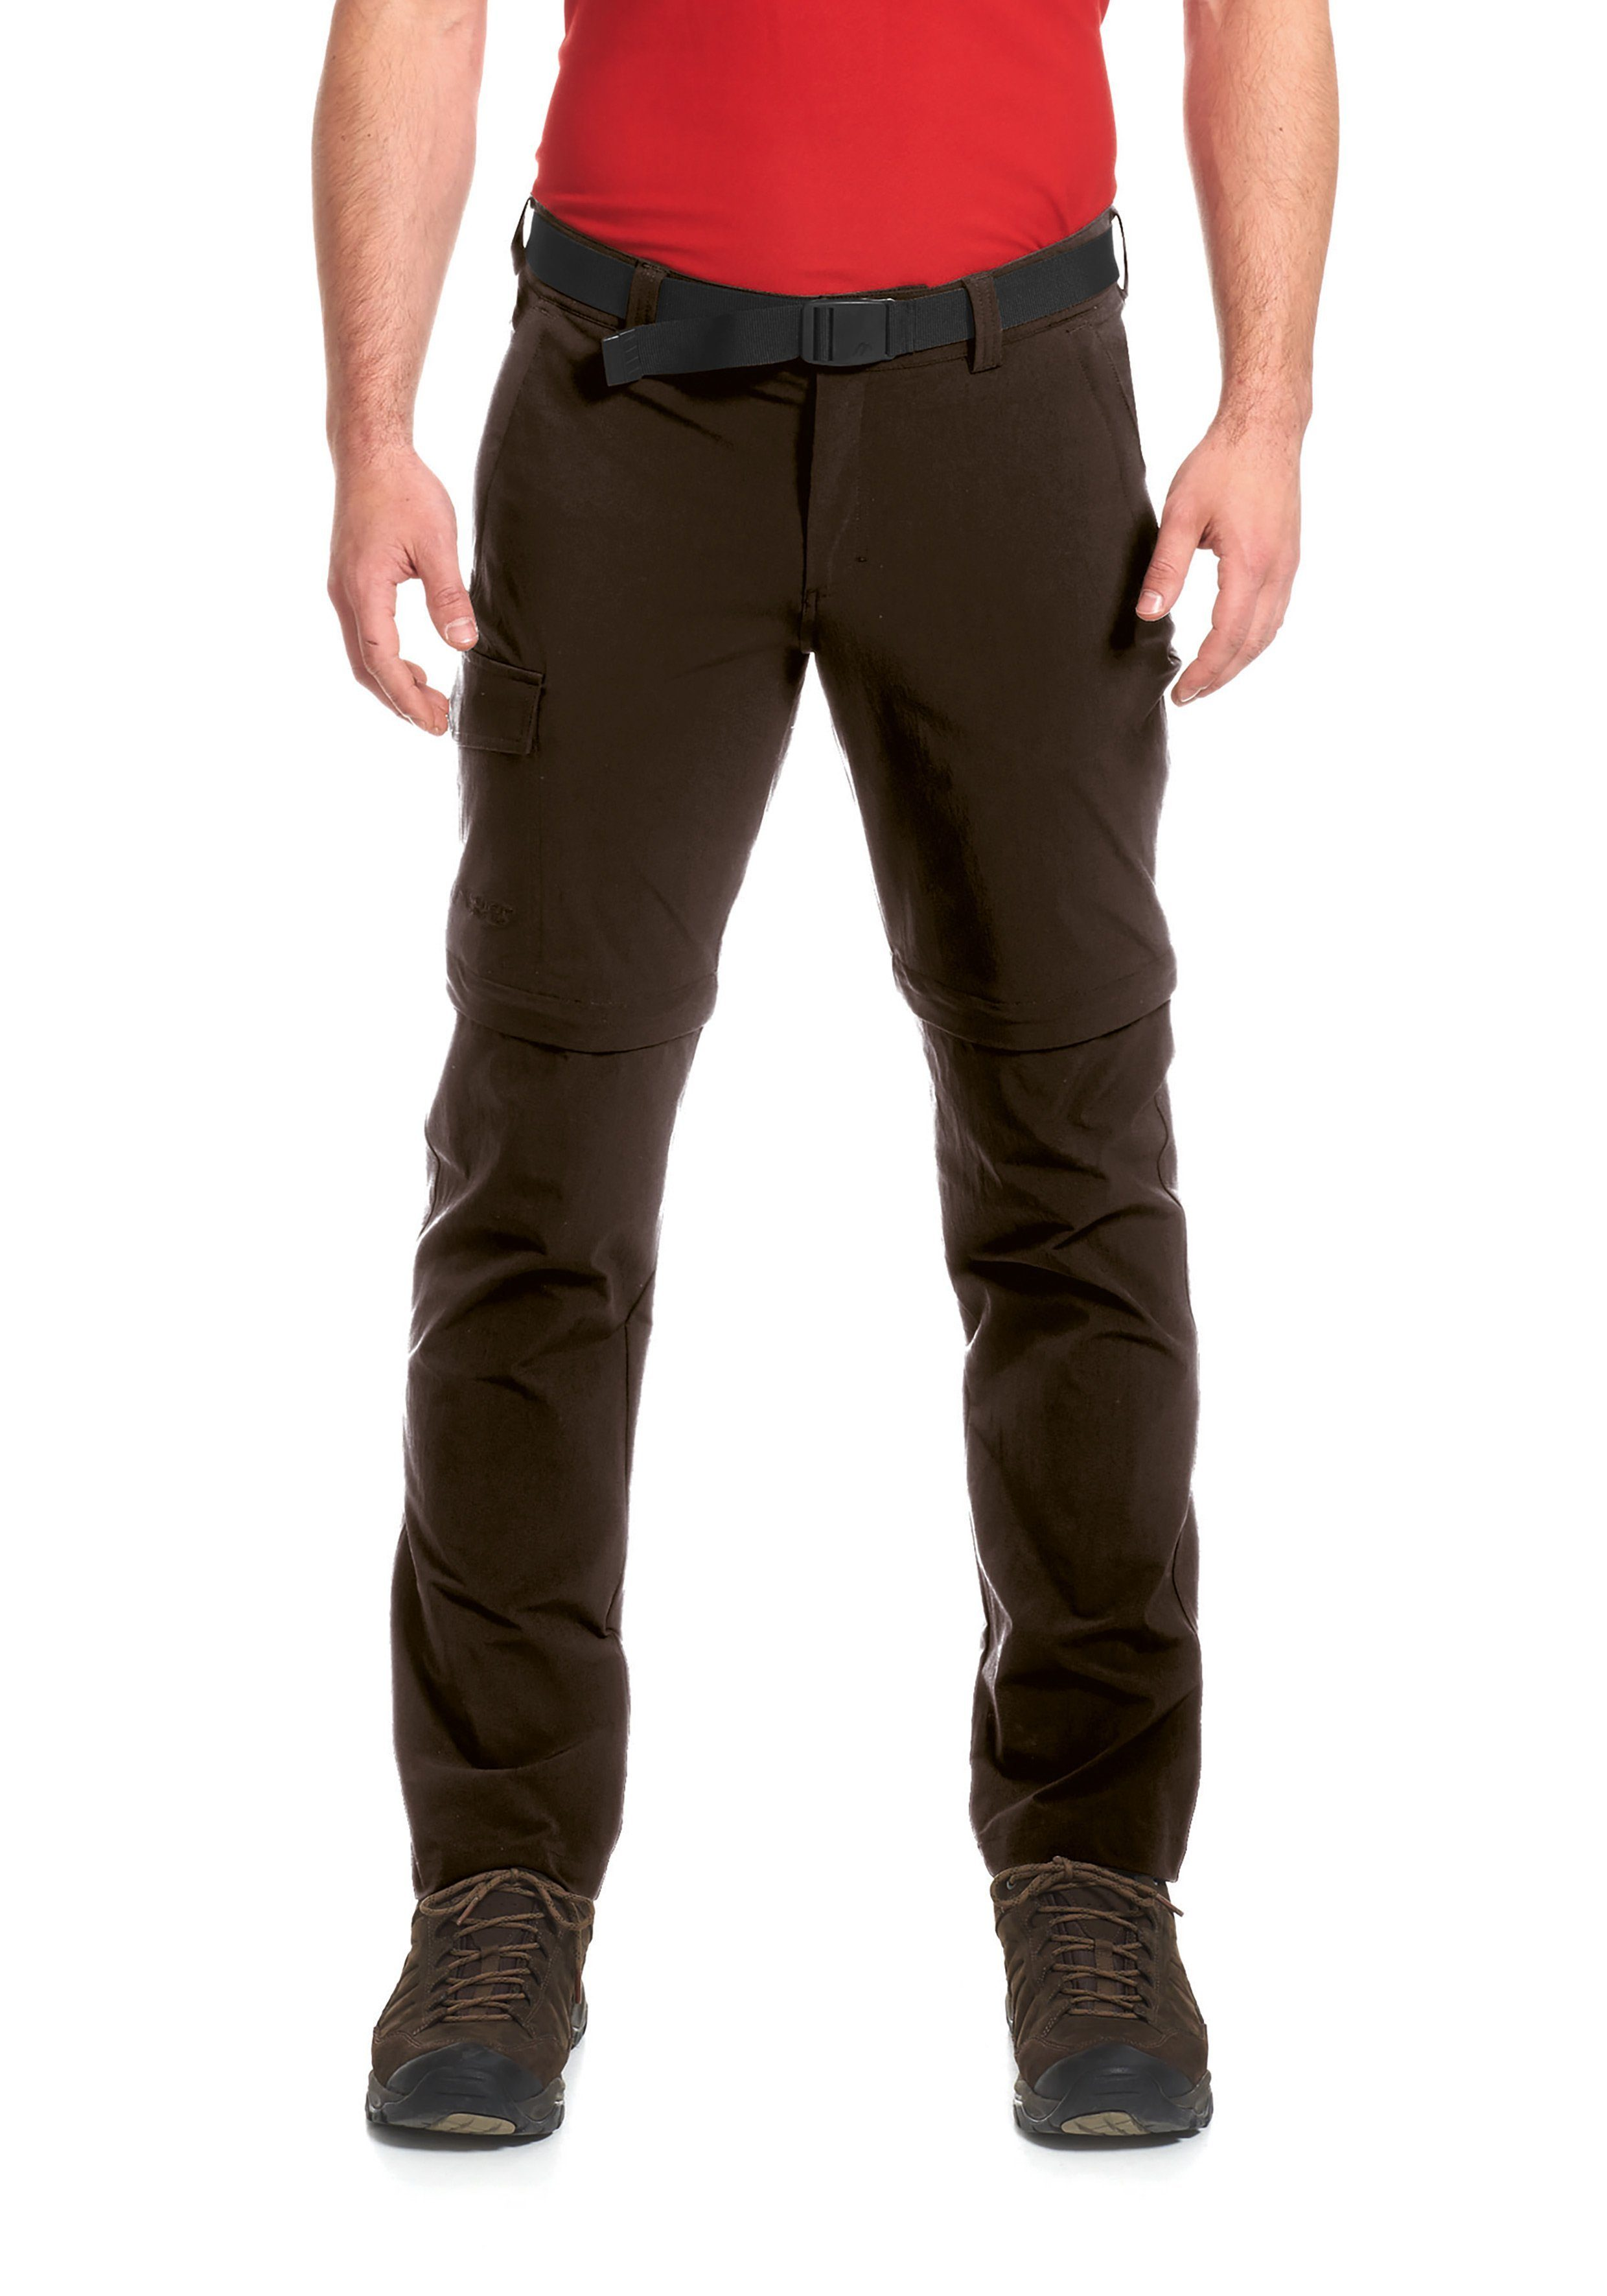 Maier Sports Funktionshose Torid slim zip | Sportbekleidung > Sporthosen | Braun | Maier Sports